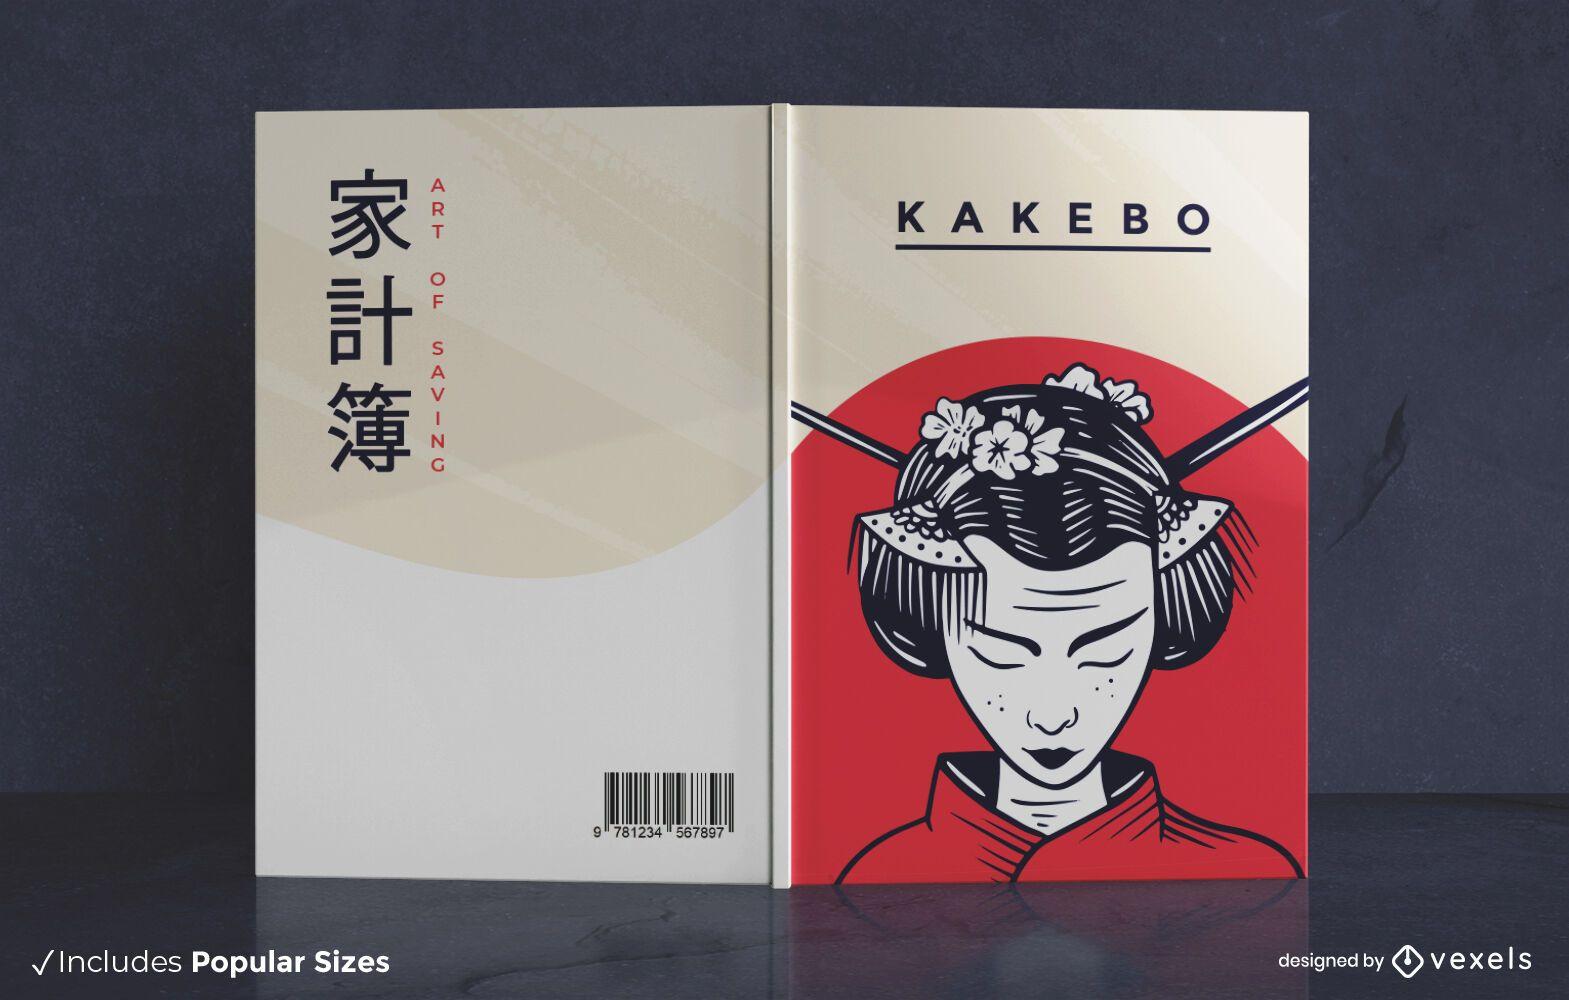 Kakebo japanese book cover design